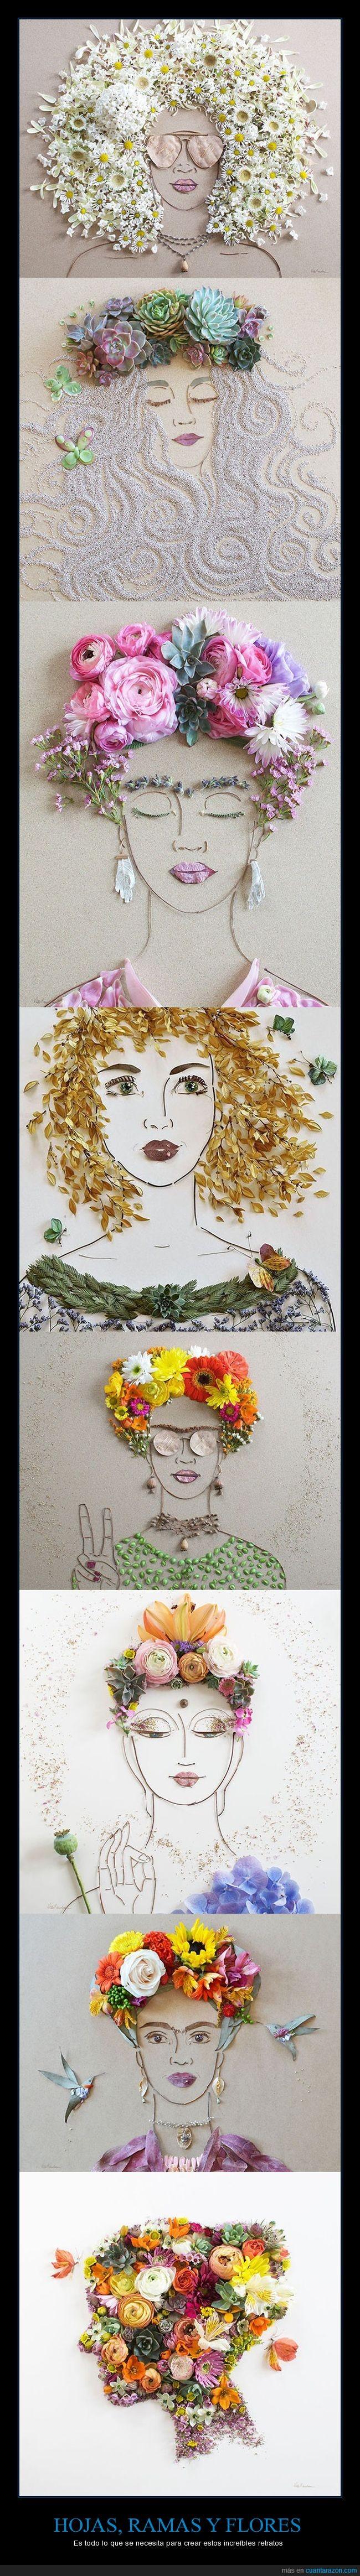 flores,hojas,ramas,retratos